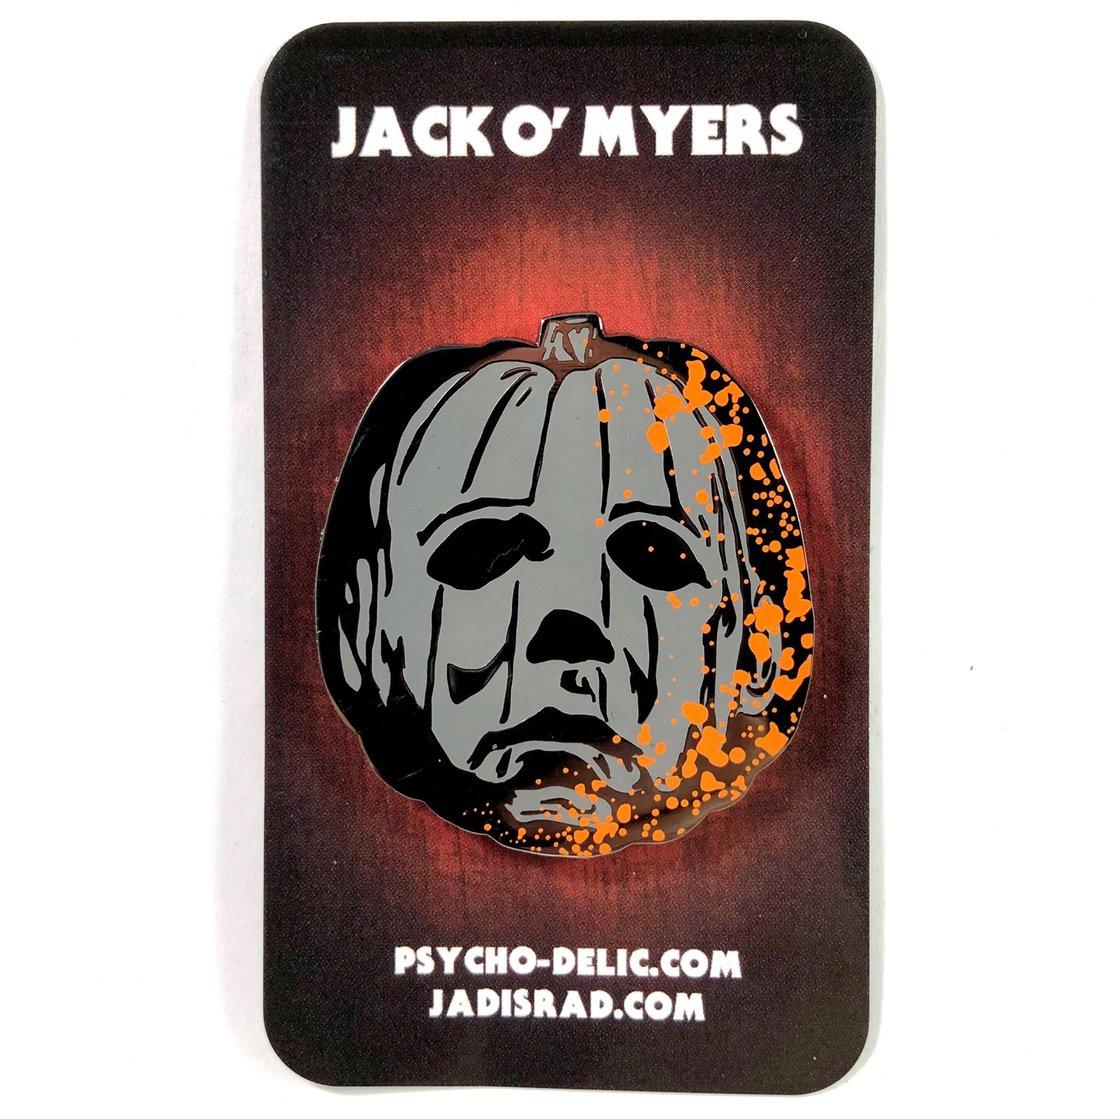 Image of Jack O' Myers Version 4 (Splatter) Pin